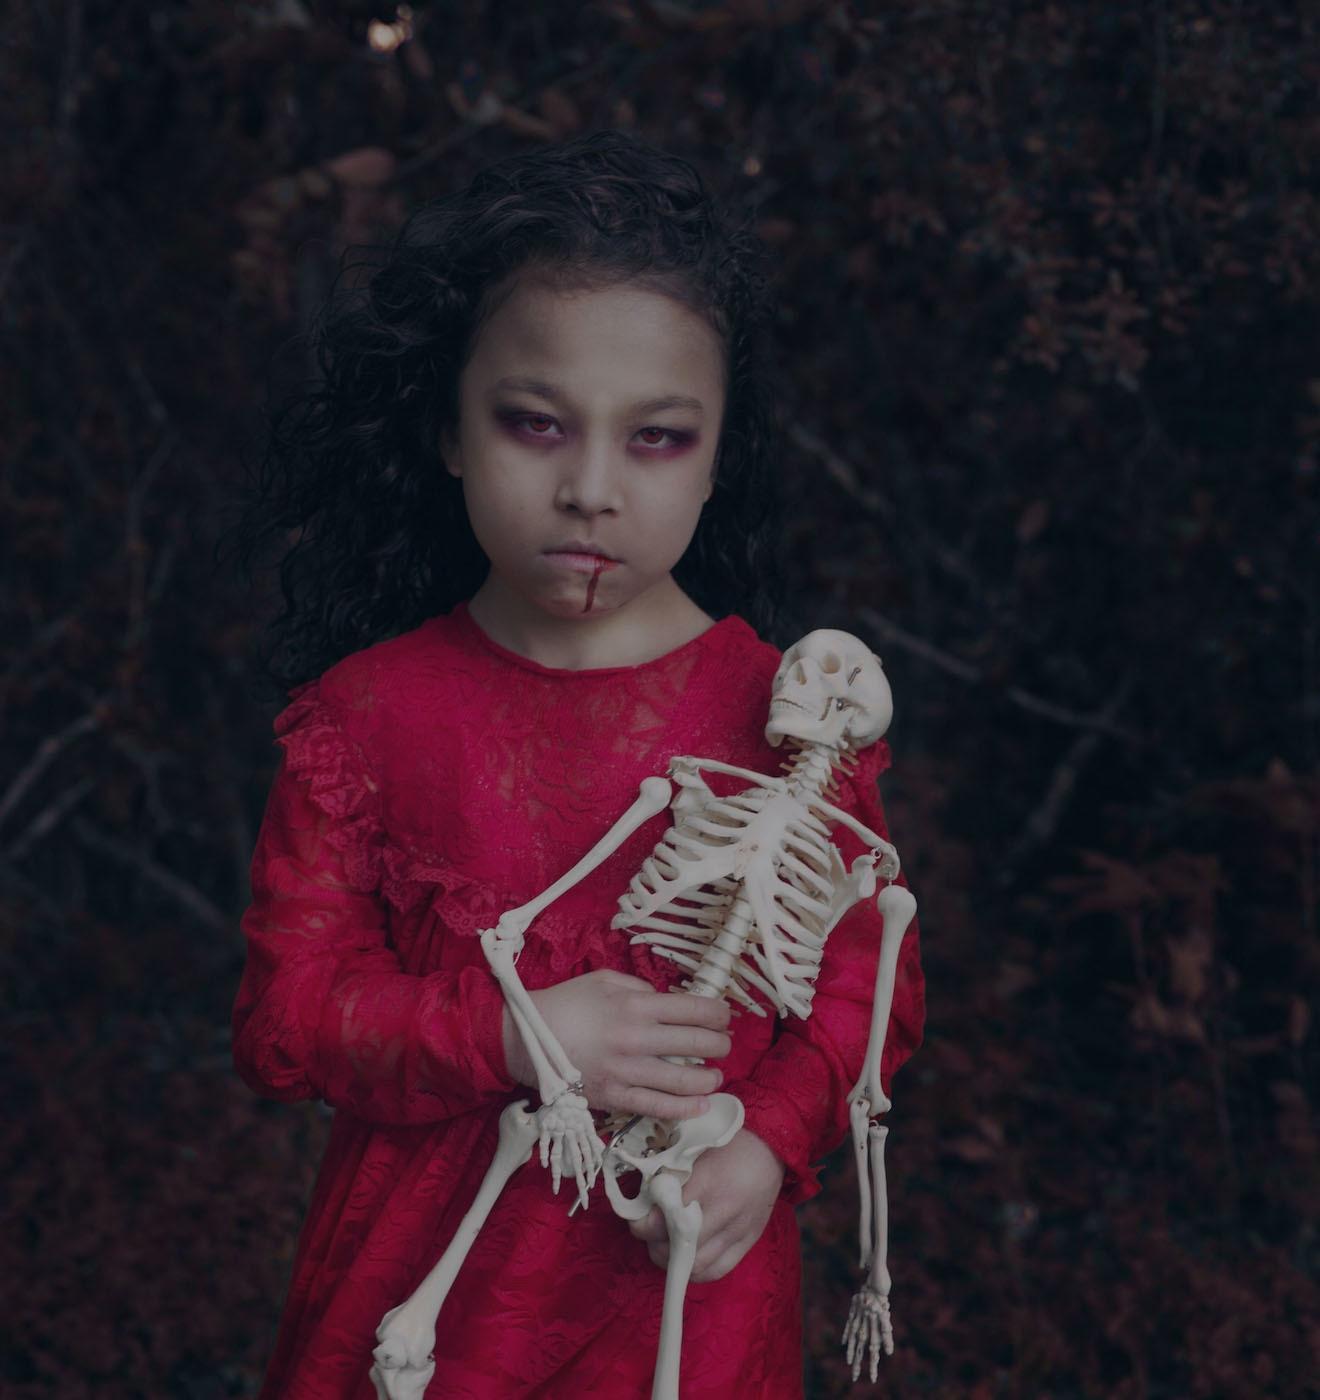 photographs-of-child-zombies-601-body-image-1433189222.jpg